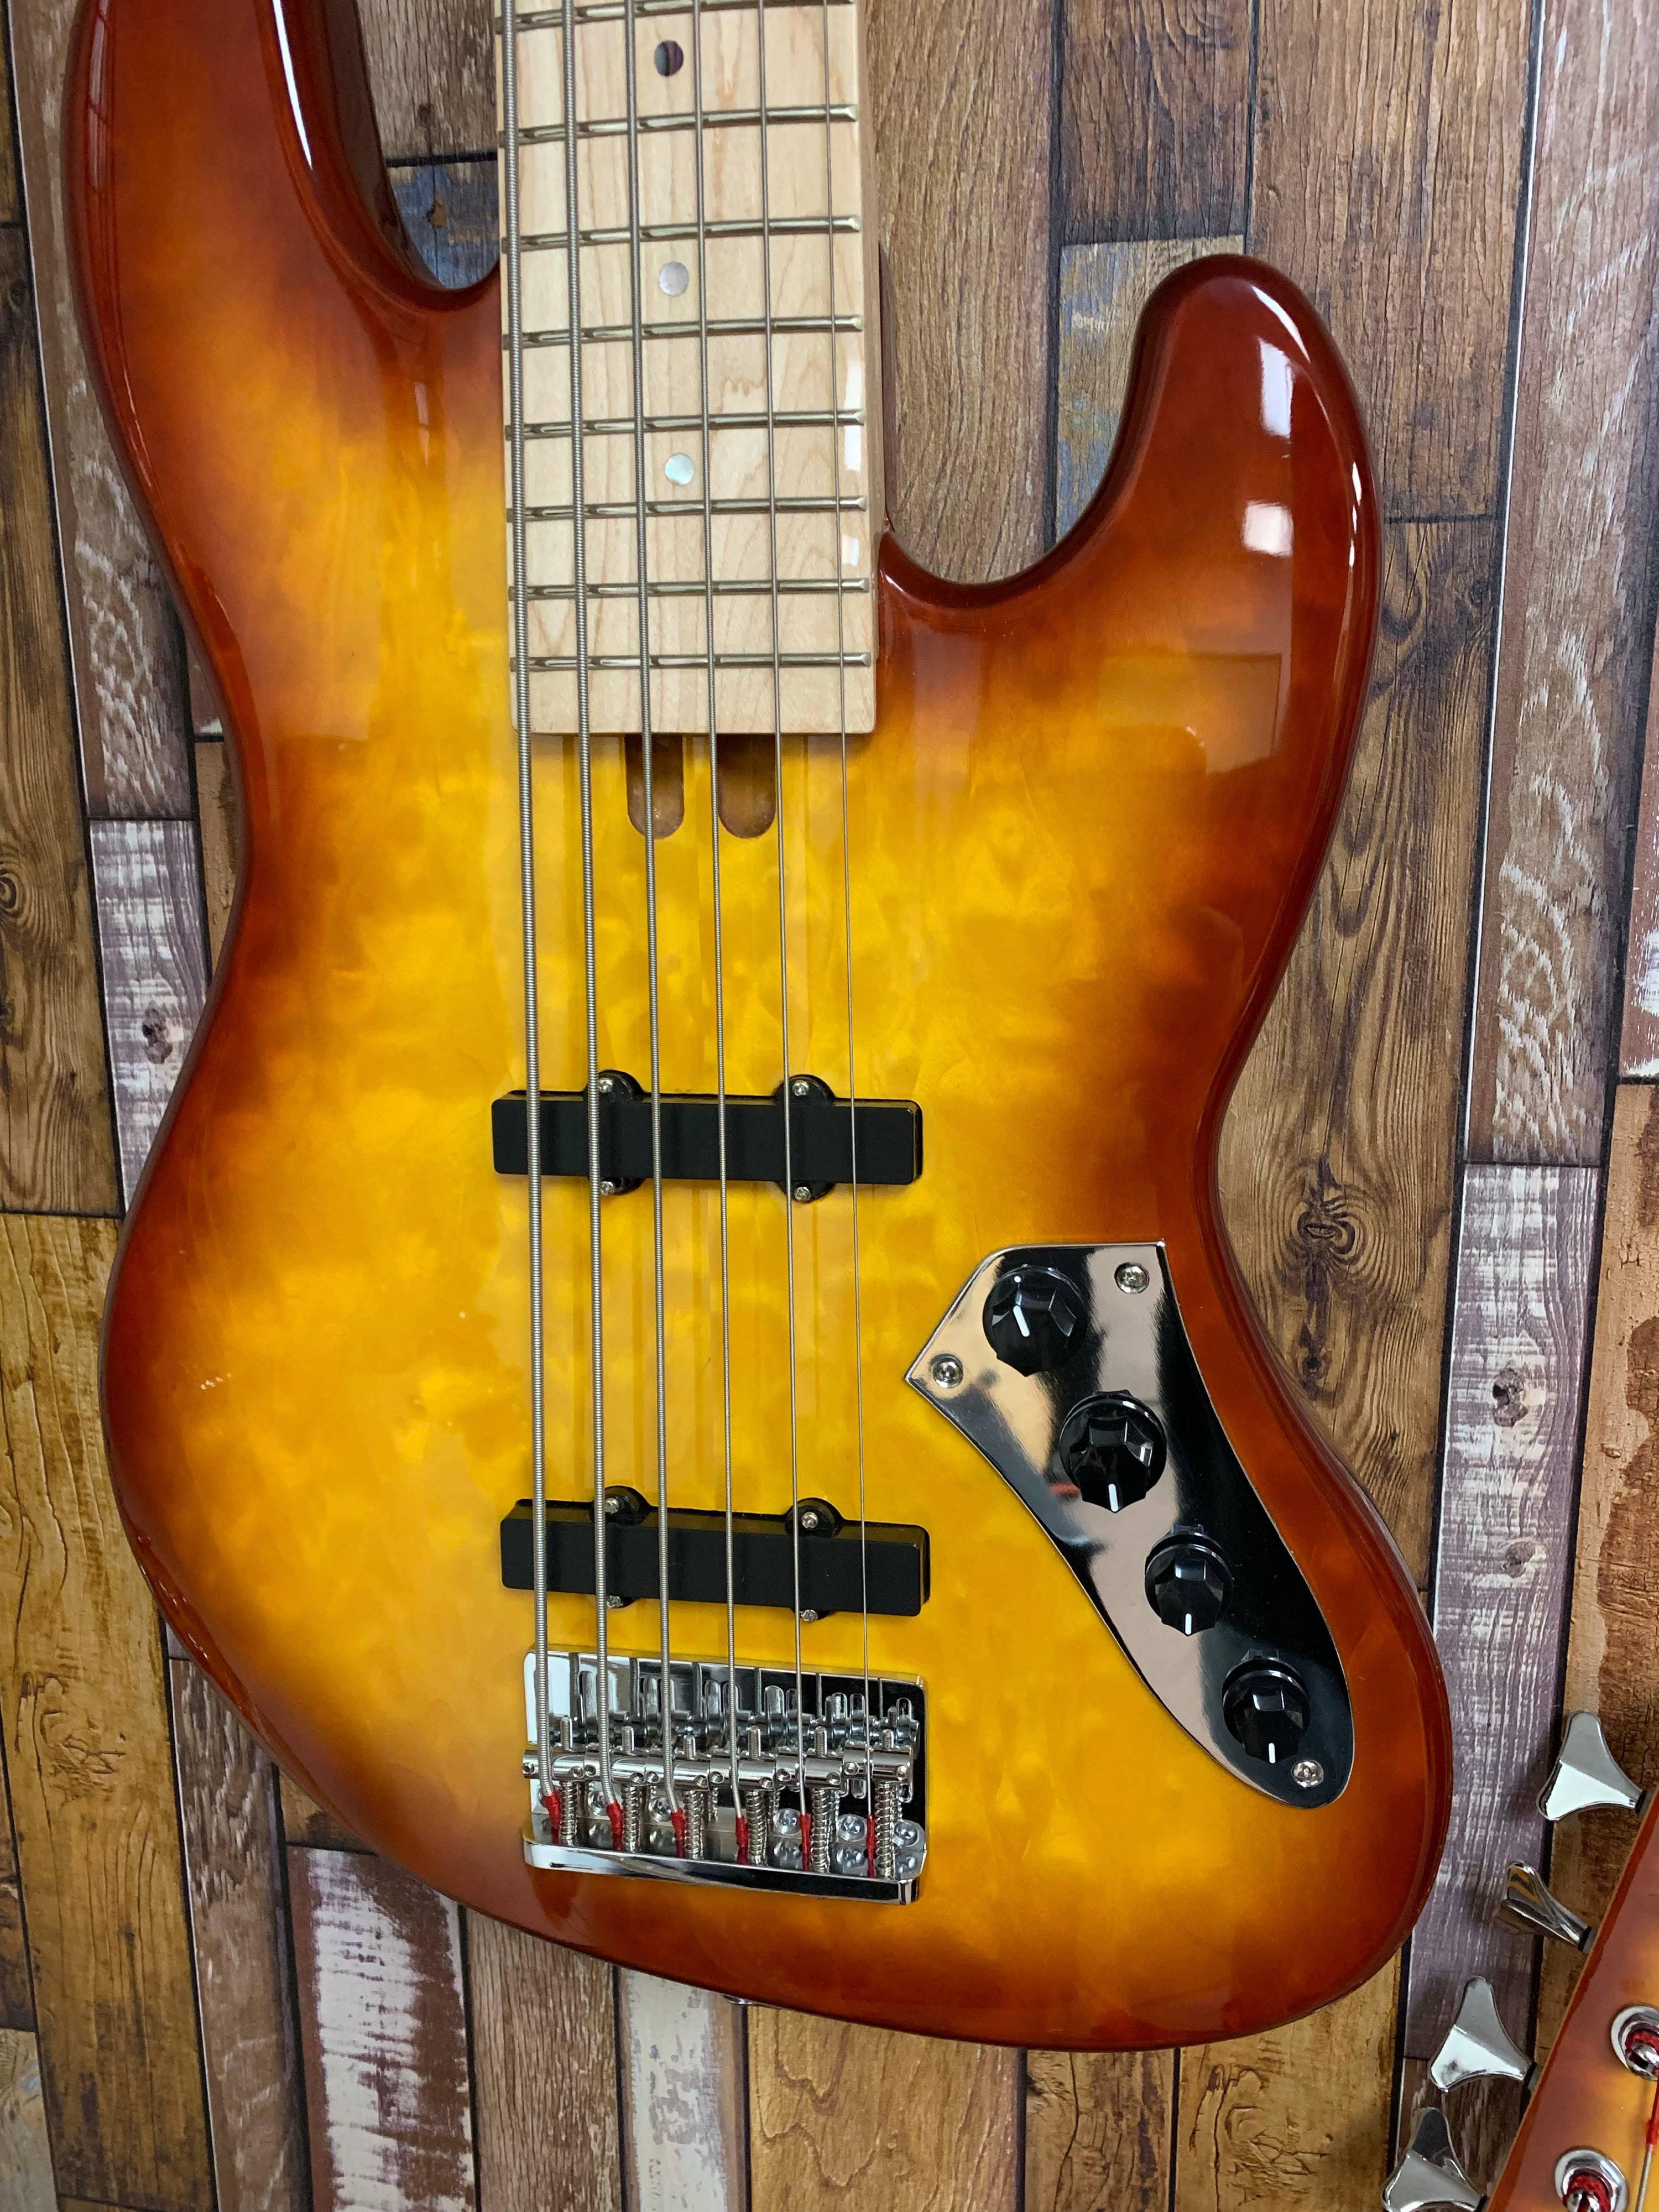 Allen Eden Disciple 6 Deluxe Bass Guitar with EC240ABS Bass Case by